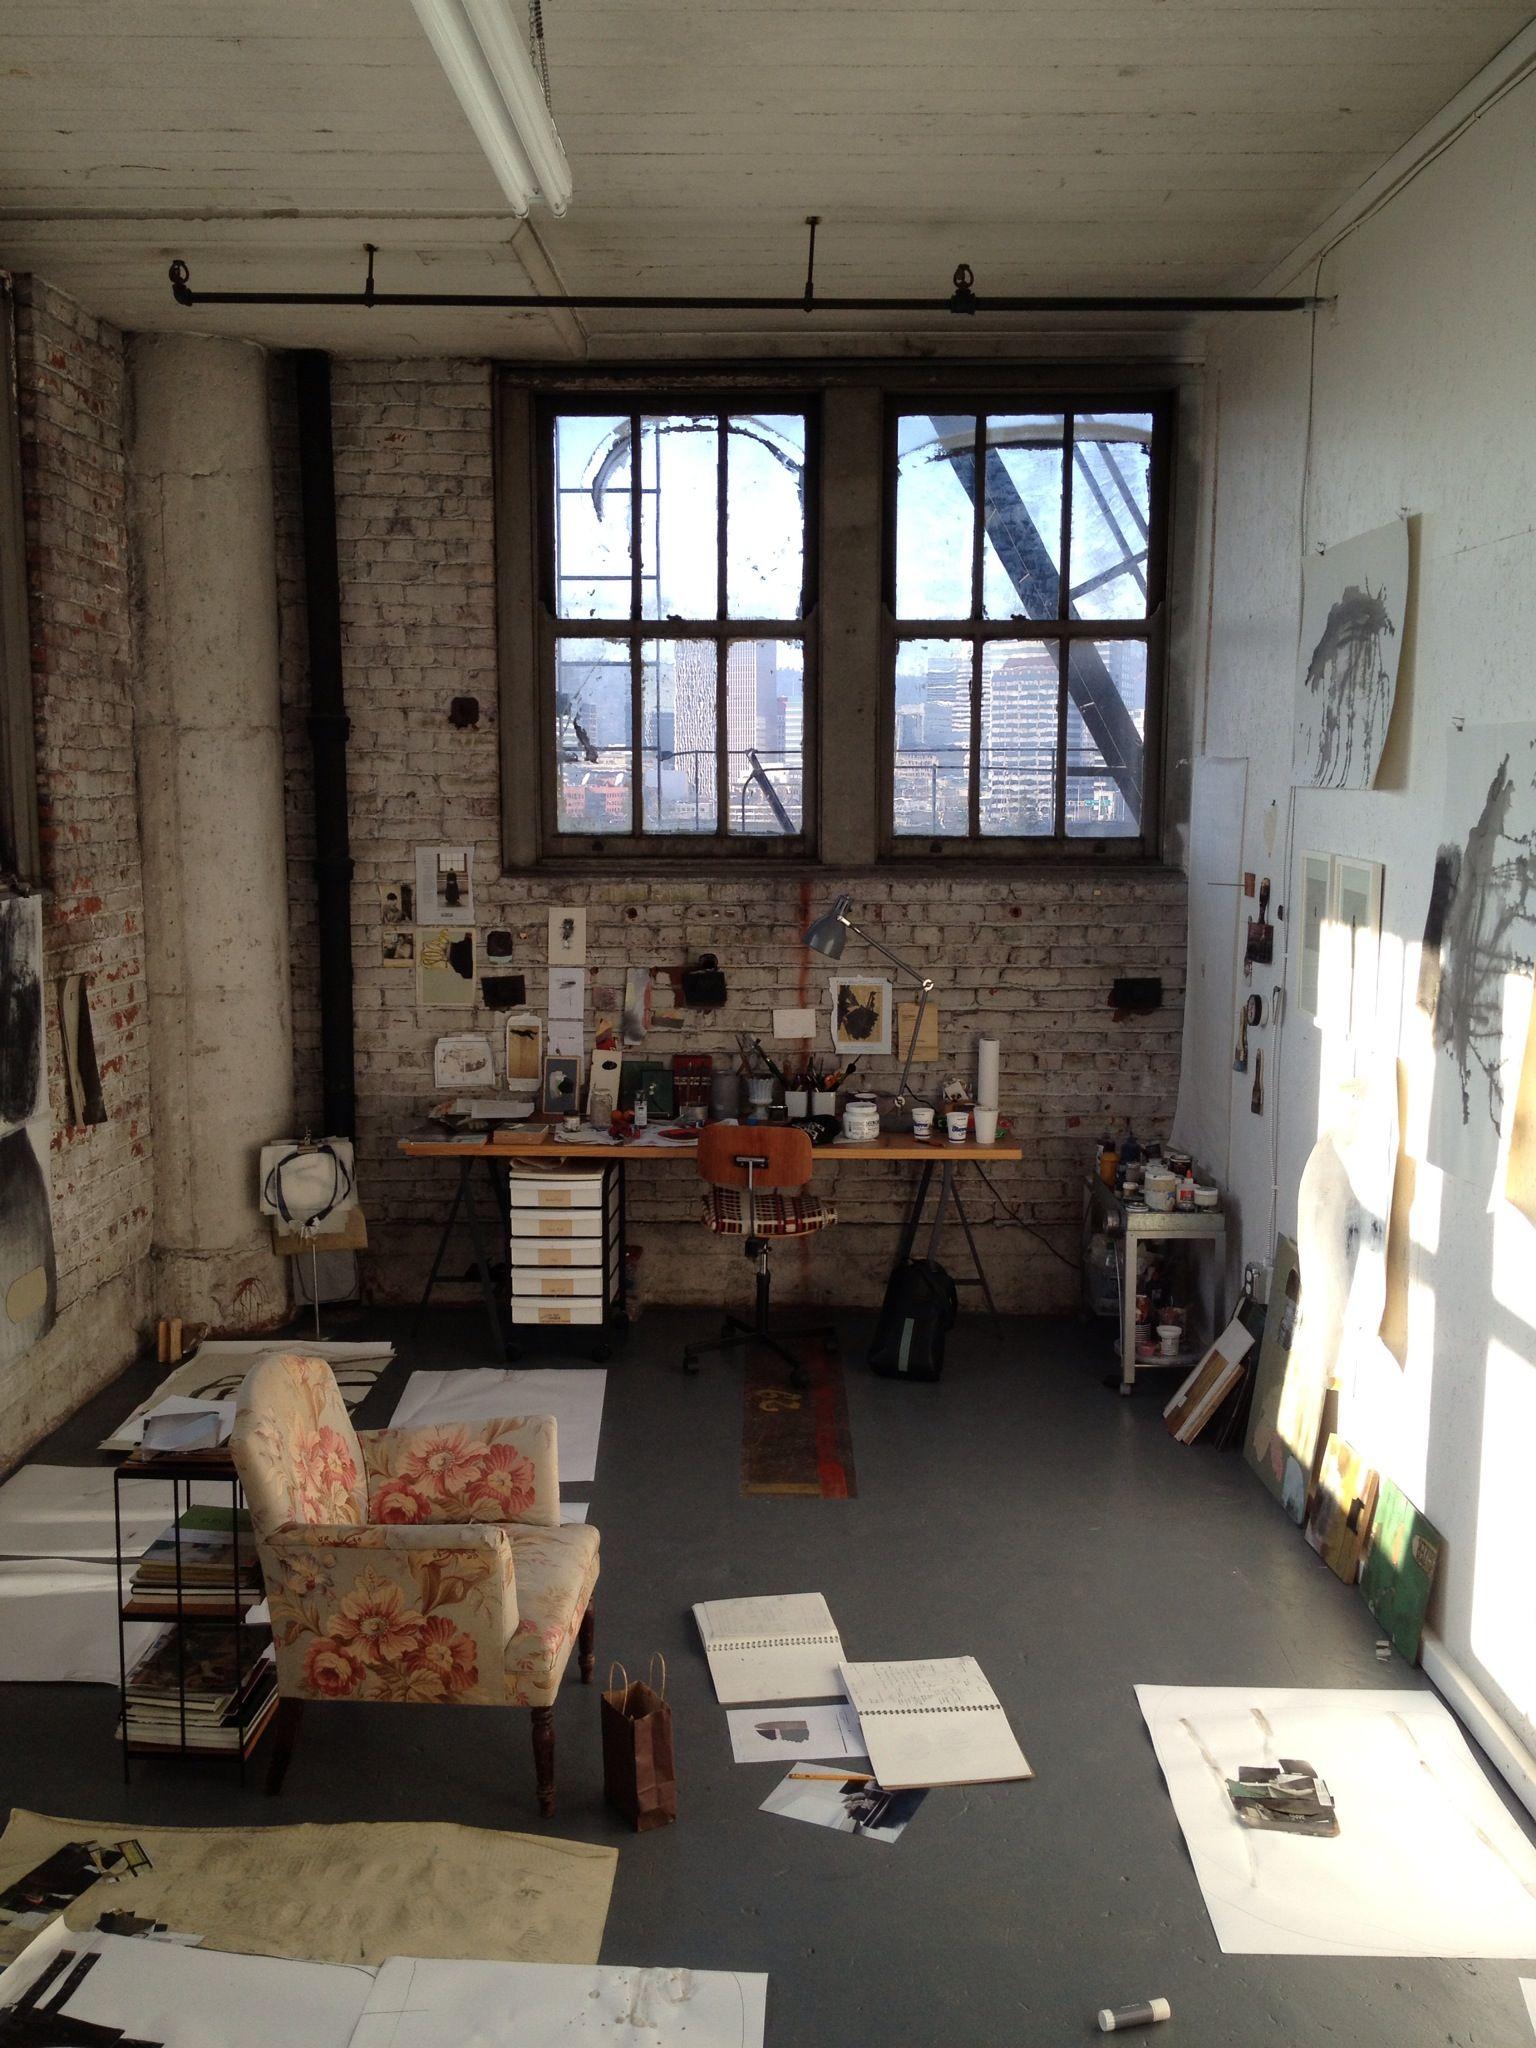 MaryAnn Pulsu0027 Studio Space. Art RoomsArt ...